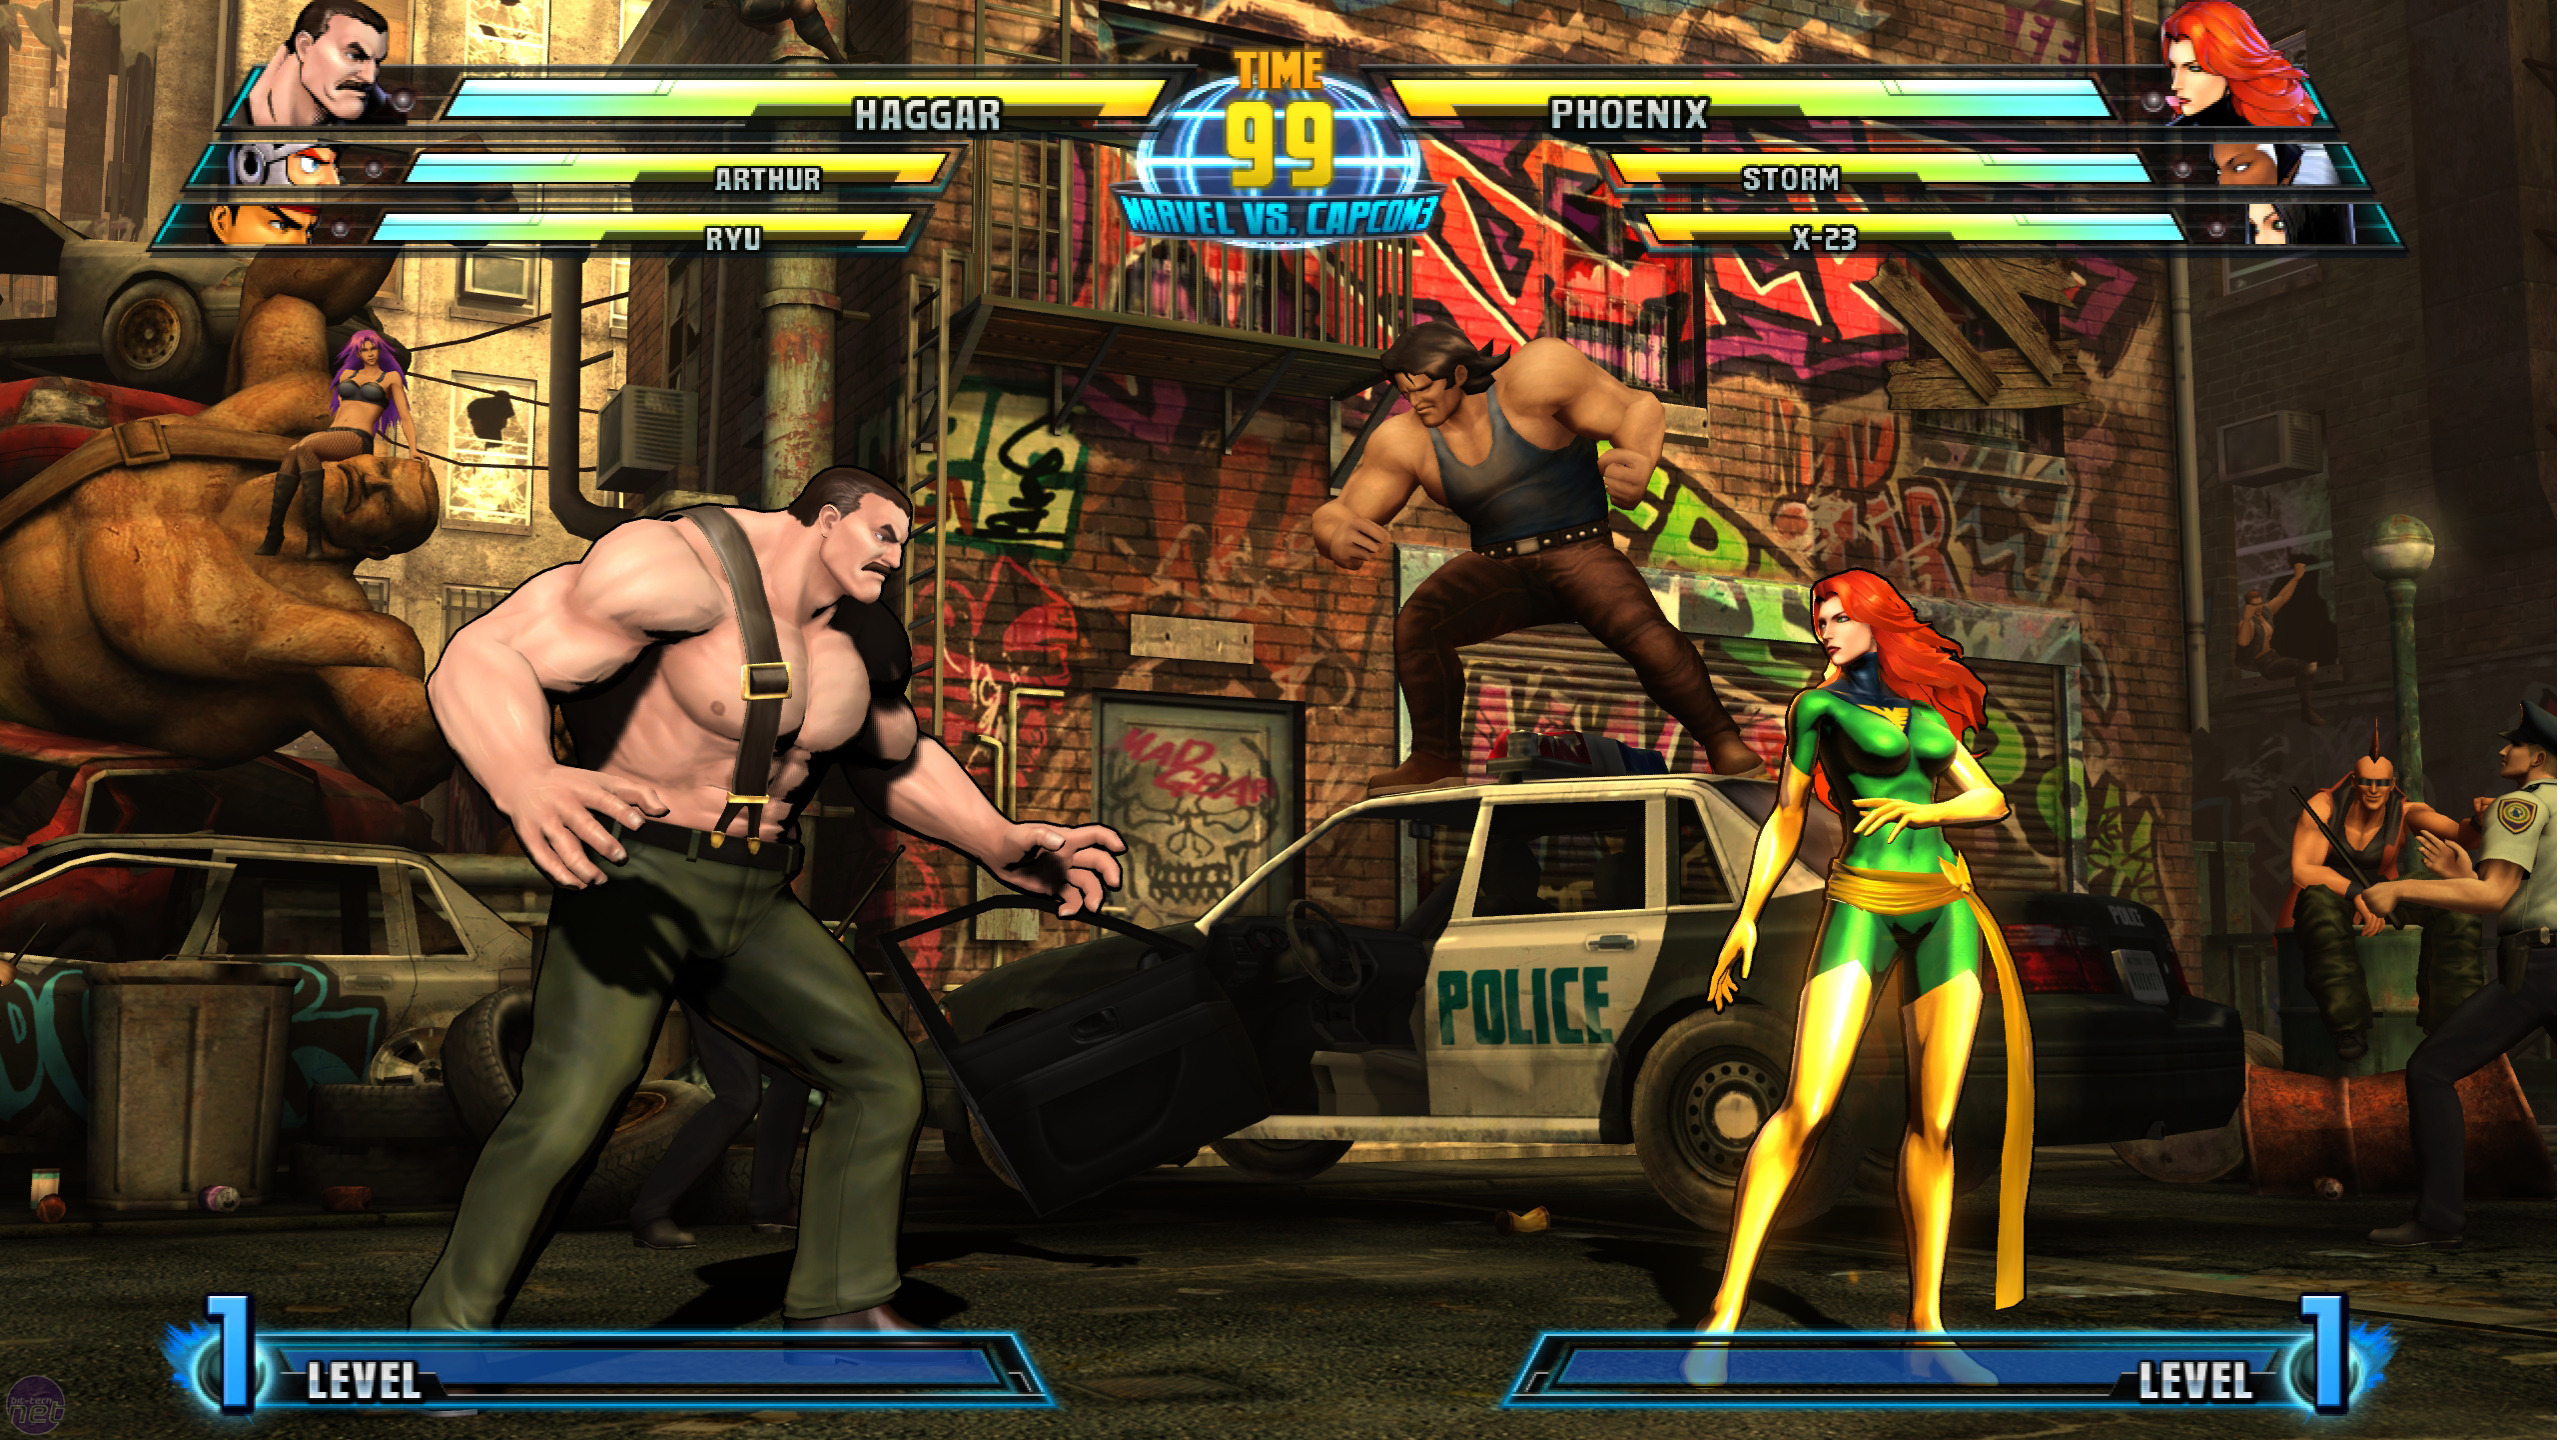 Most Viewed Marvel Vs Capcom 3 Wallpapers 4k Wallpapers